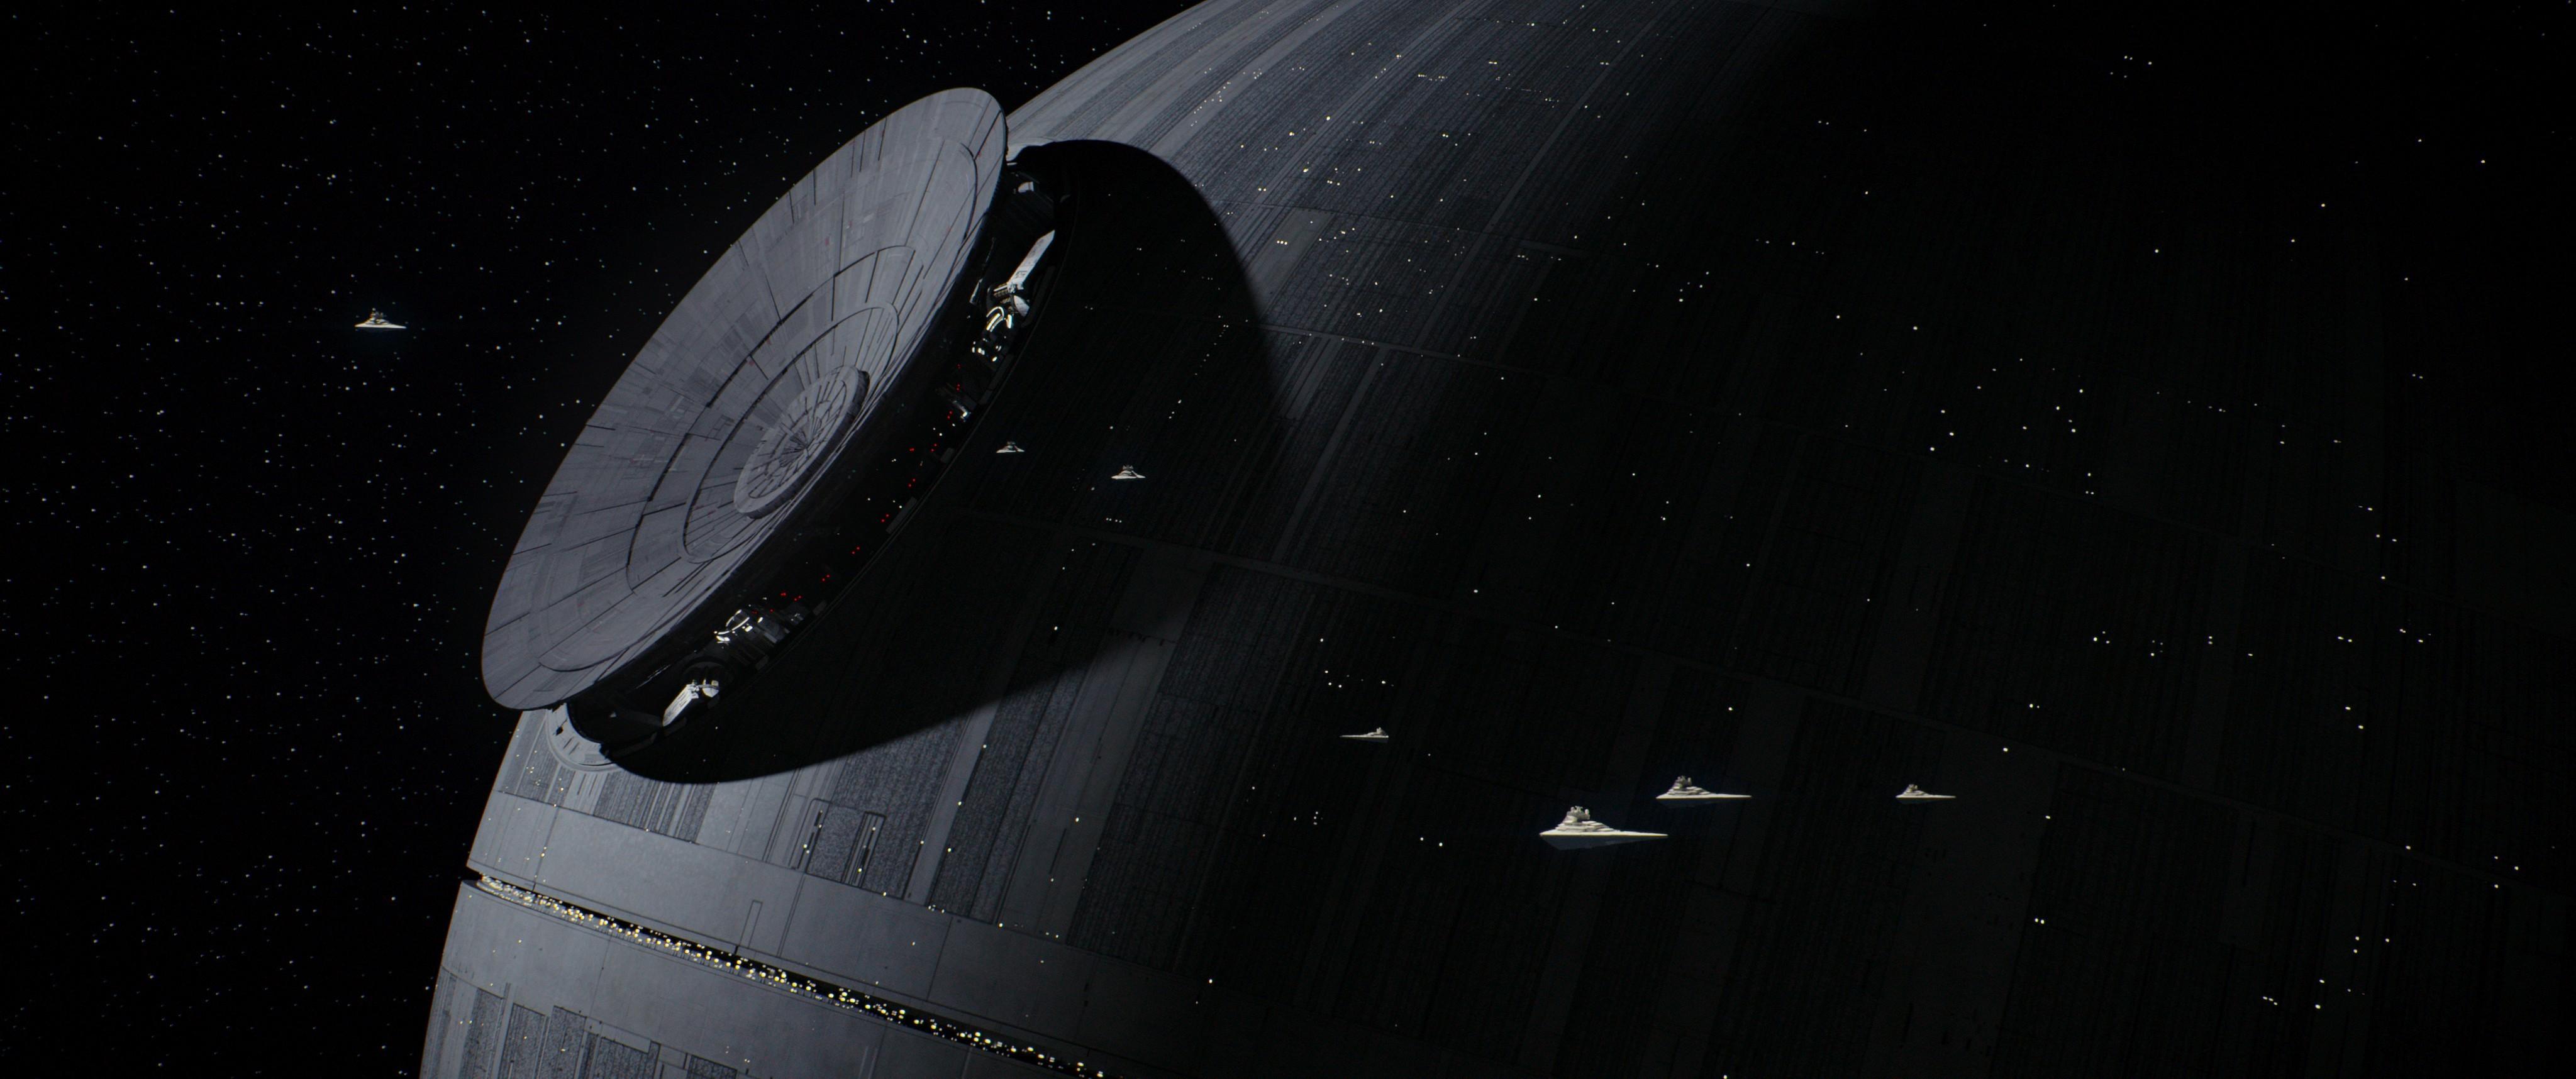 Star Wars Rogue One Wallpaper: Wallpaper Rogue One: A Star Wars Story, Star Ship, Best